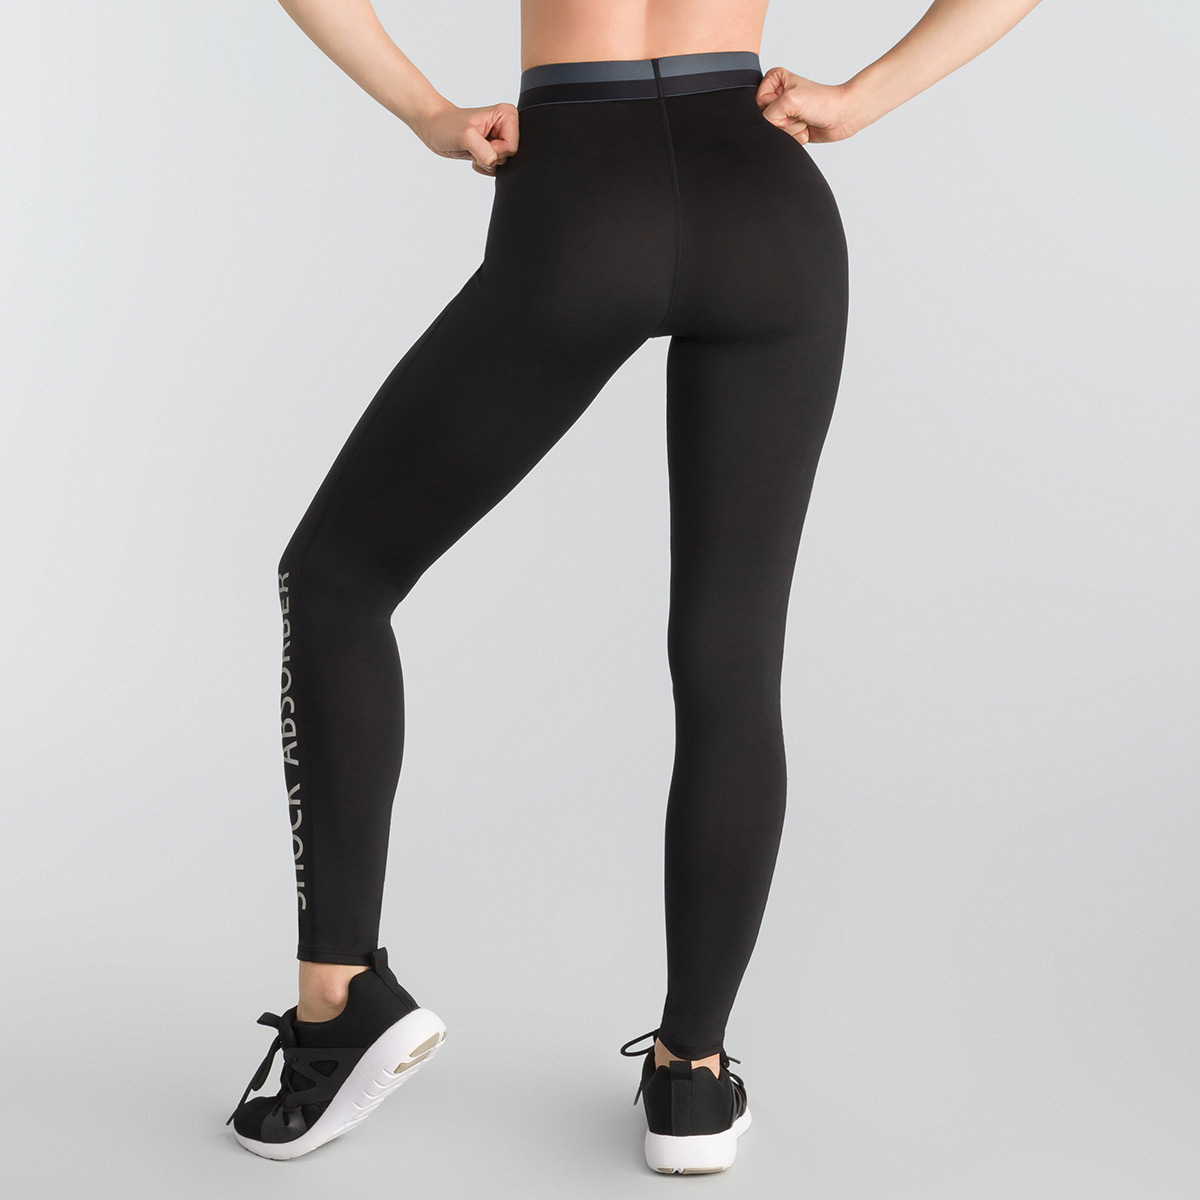 Legging sport femme coloris noir Active Wear Shock Absorber, , DIM